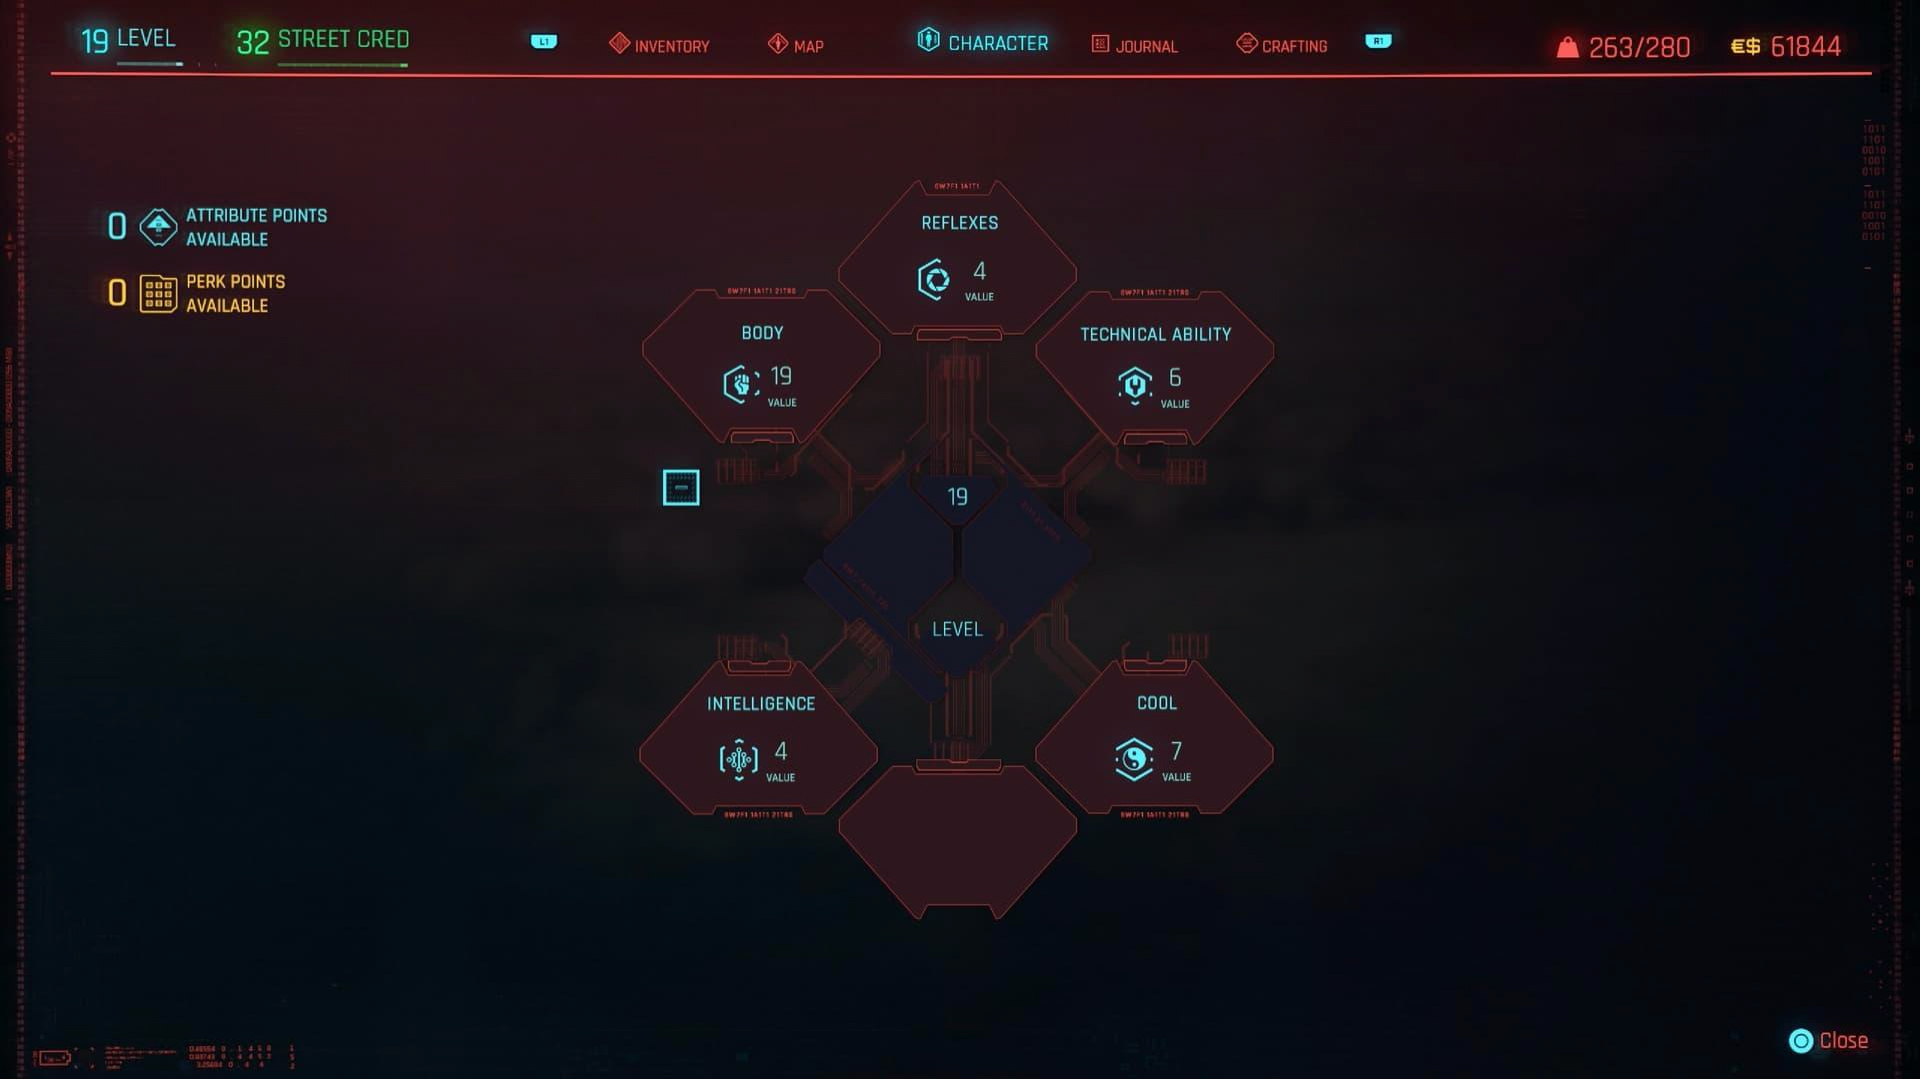 respending attributes cyberpunk 2077 video game